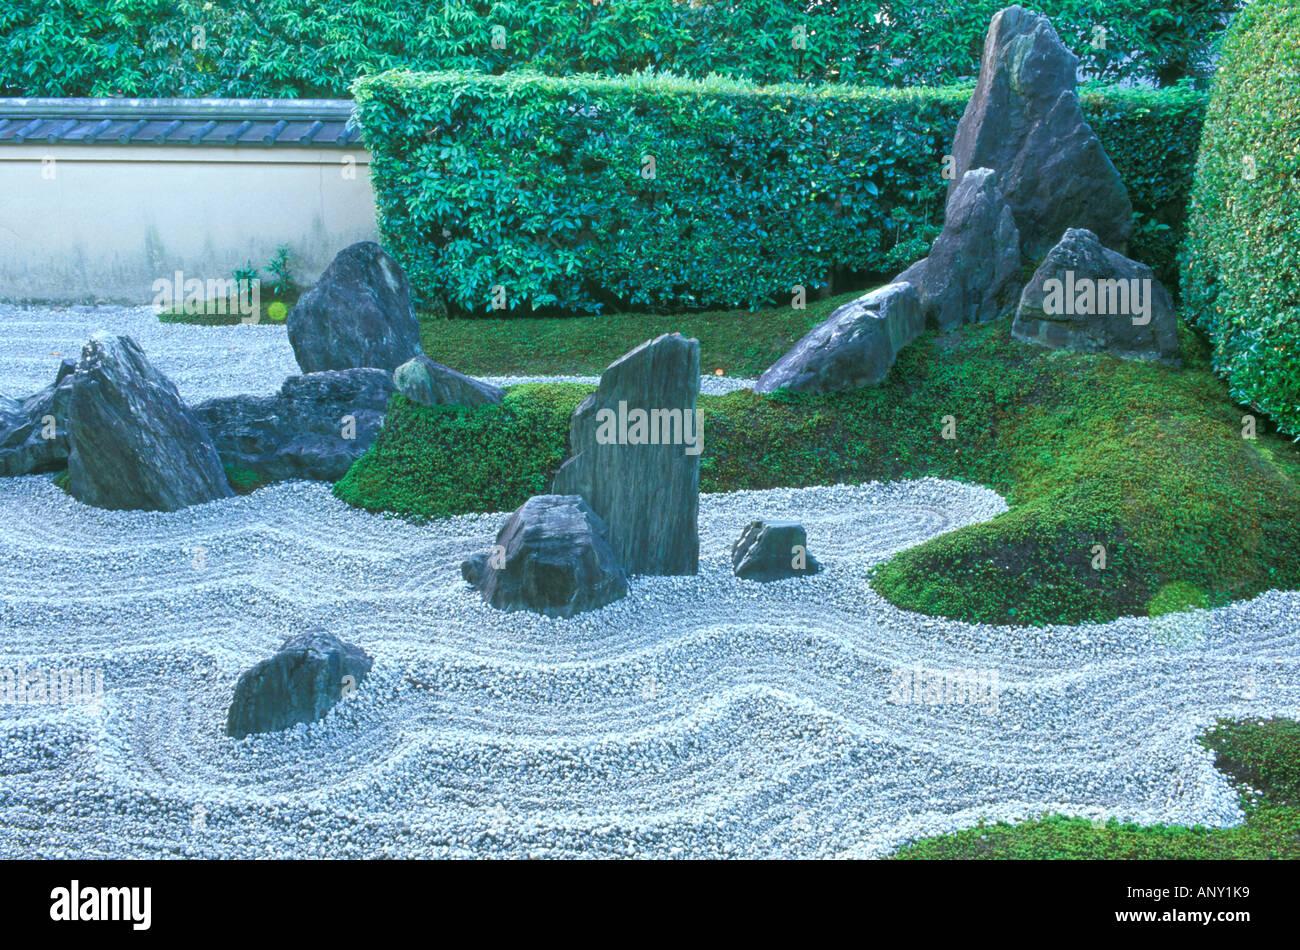 Asia, Japan, Kyoto, Daitokuji Temple, Zuiho-in Rock Garden - Stock Image